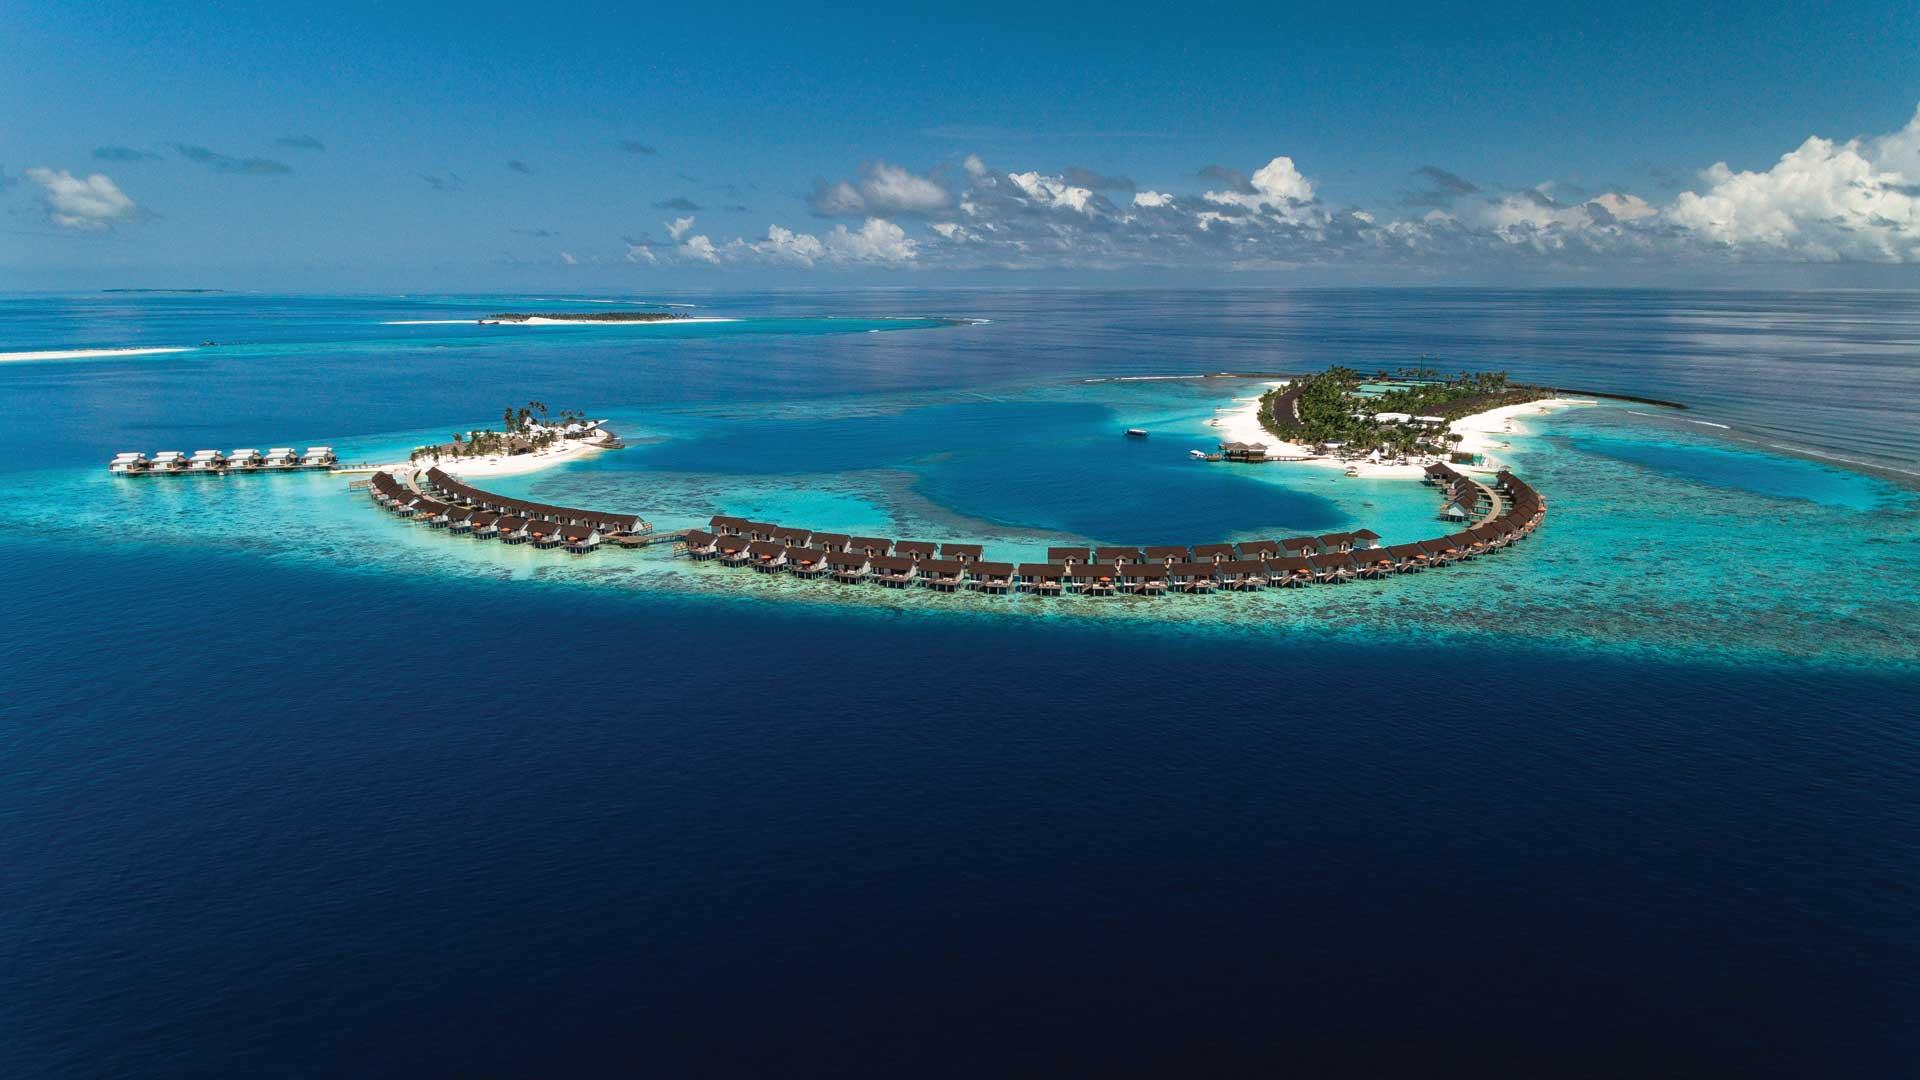 OBLU SELECT AT SANGELI Maldives (โอบลู ซีเล็ค แอท เซนเกลี มัลดีฟส์) ช่วงสงกรานต์ รวมตั๋วเครื่องบิน ราคาเริ่มต้น 45,900 บาท เหมาะสำหรับคู่รักและครอบครัว